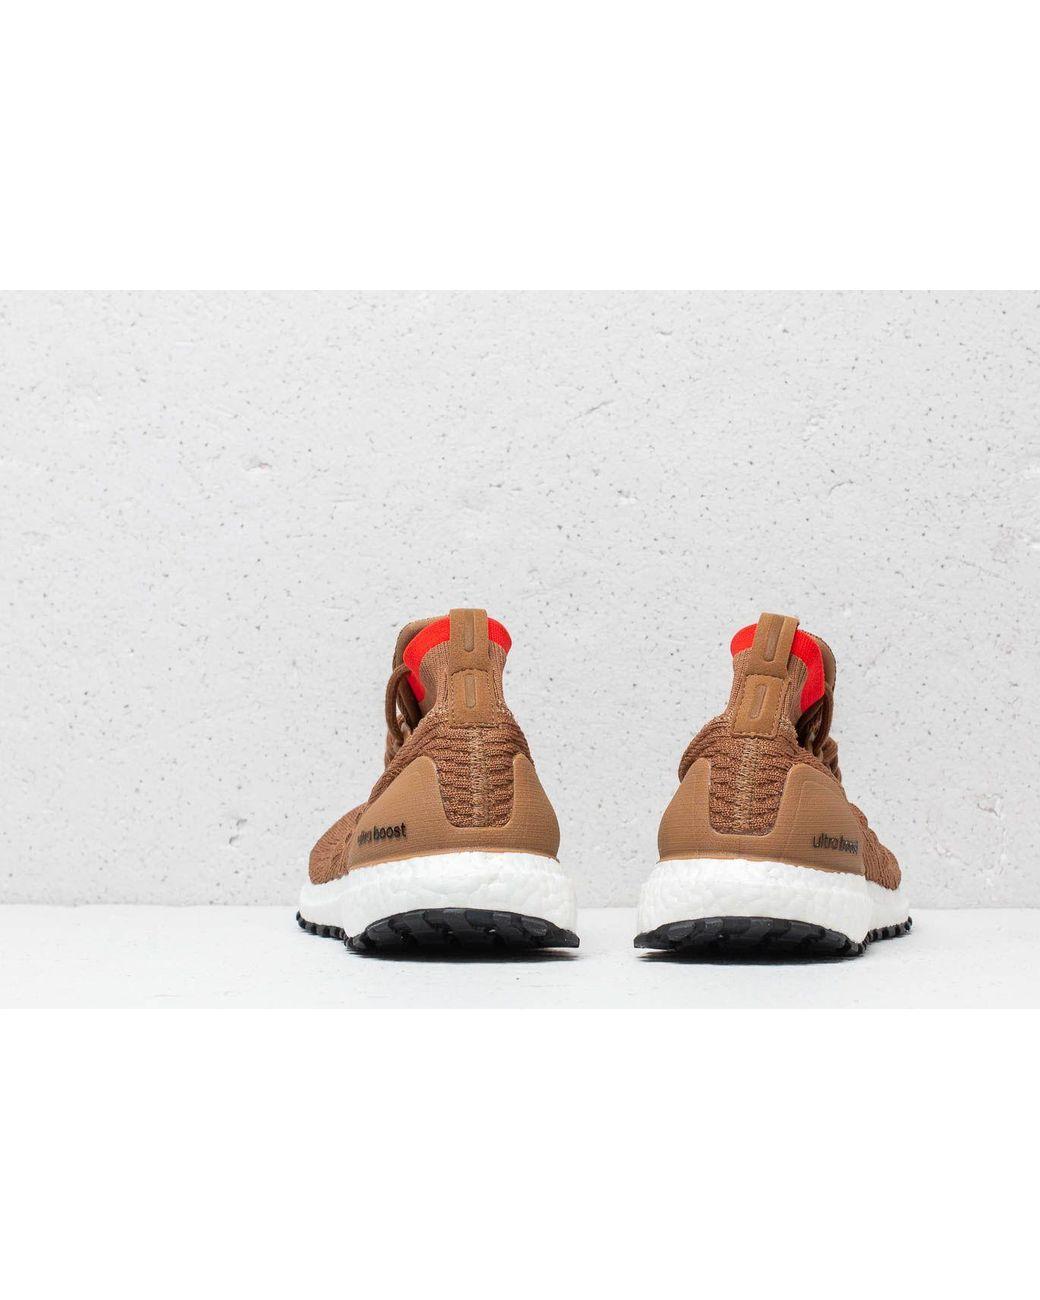 0a4d35d4f Lyst - adidas Originals Adidas Ultraboost All Terrain Raw Desert  Core Black   Cloud White for Men - Save 30%